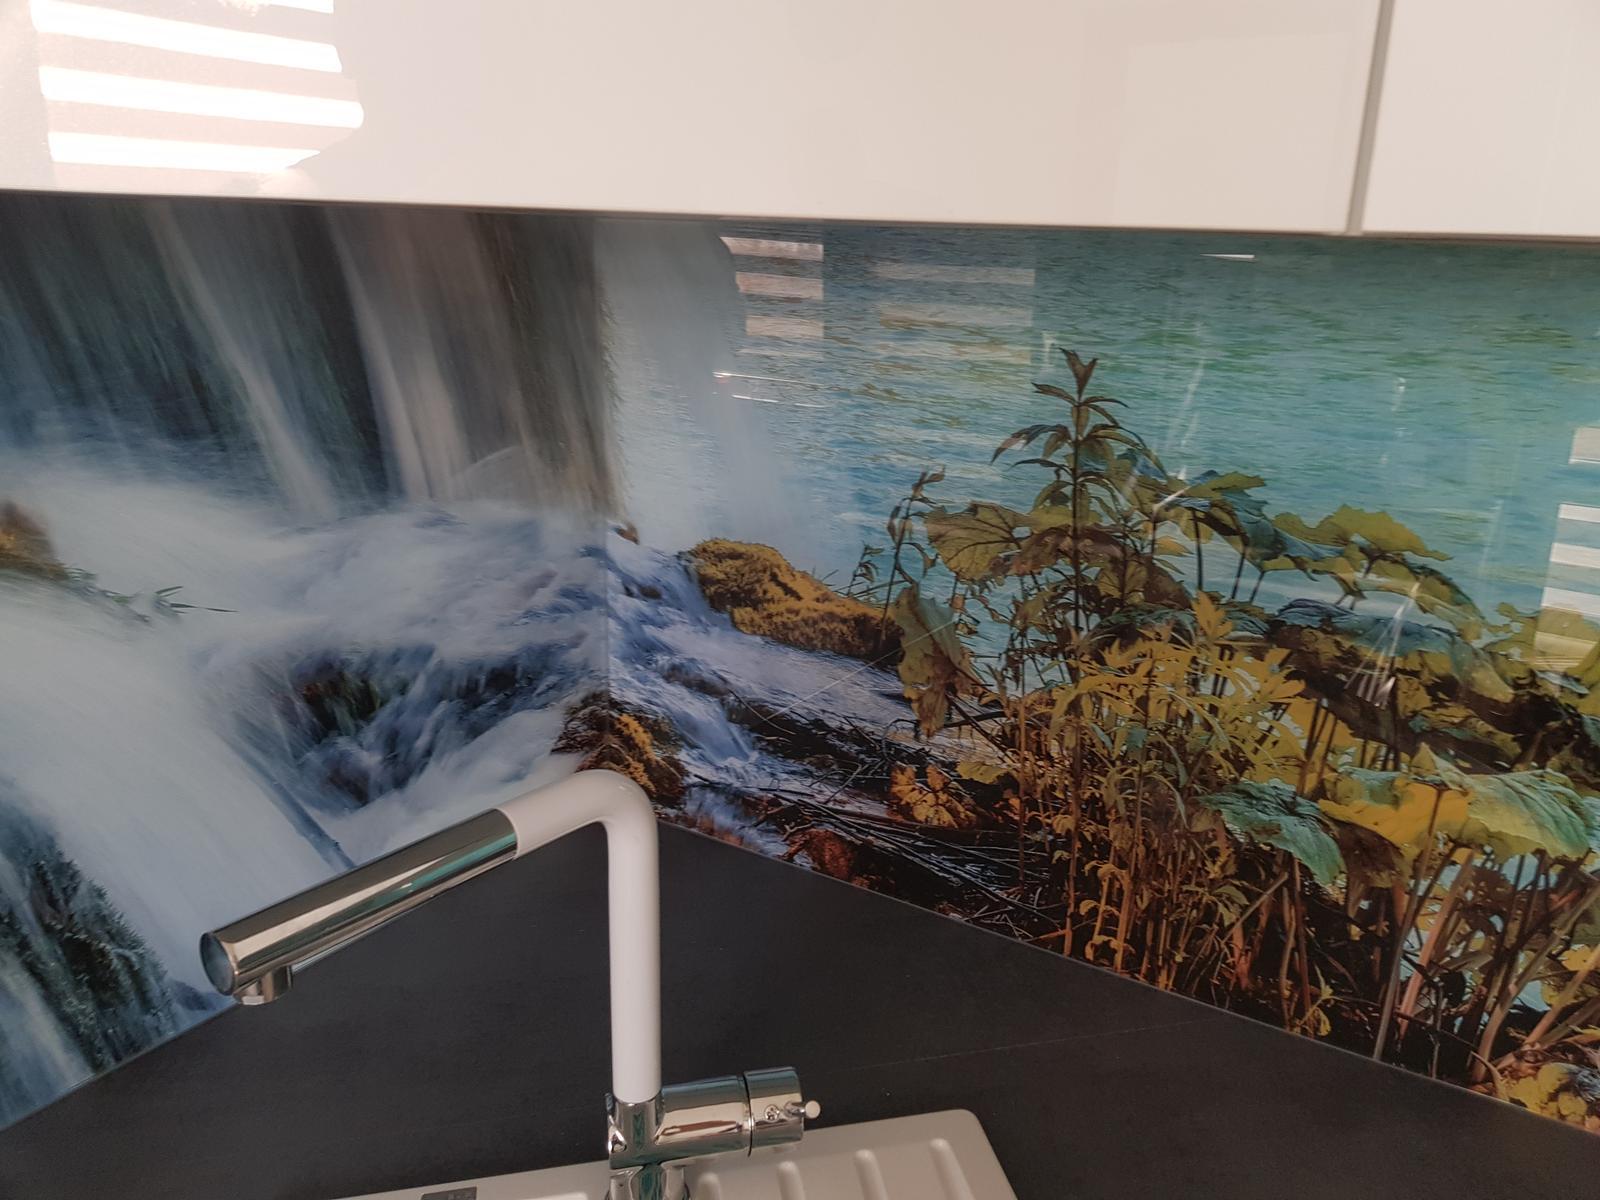 Dodávka a montáž sklenenej zásteny s motívom (Holíč). - Obrázok č. 5